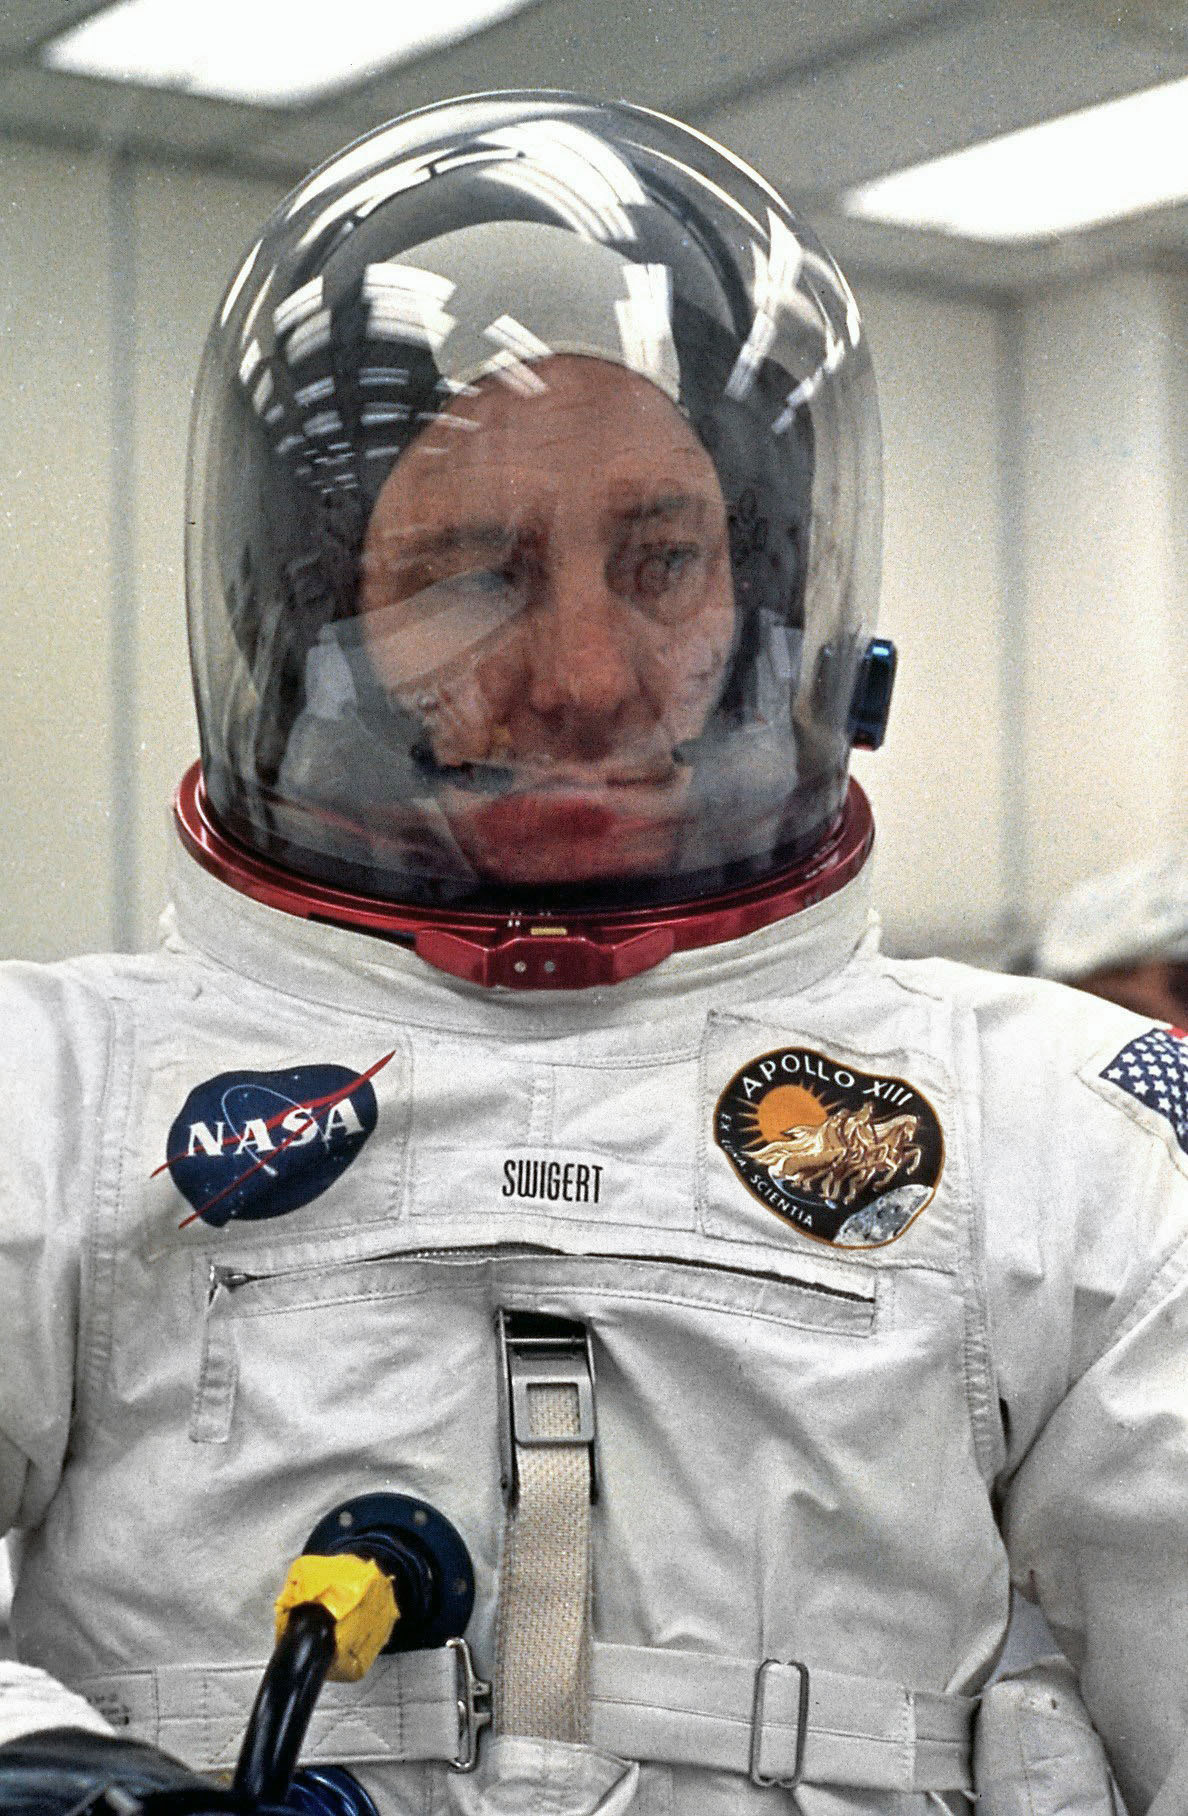 Apollo 13 Command Module Pilot Jack Swigert,